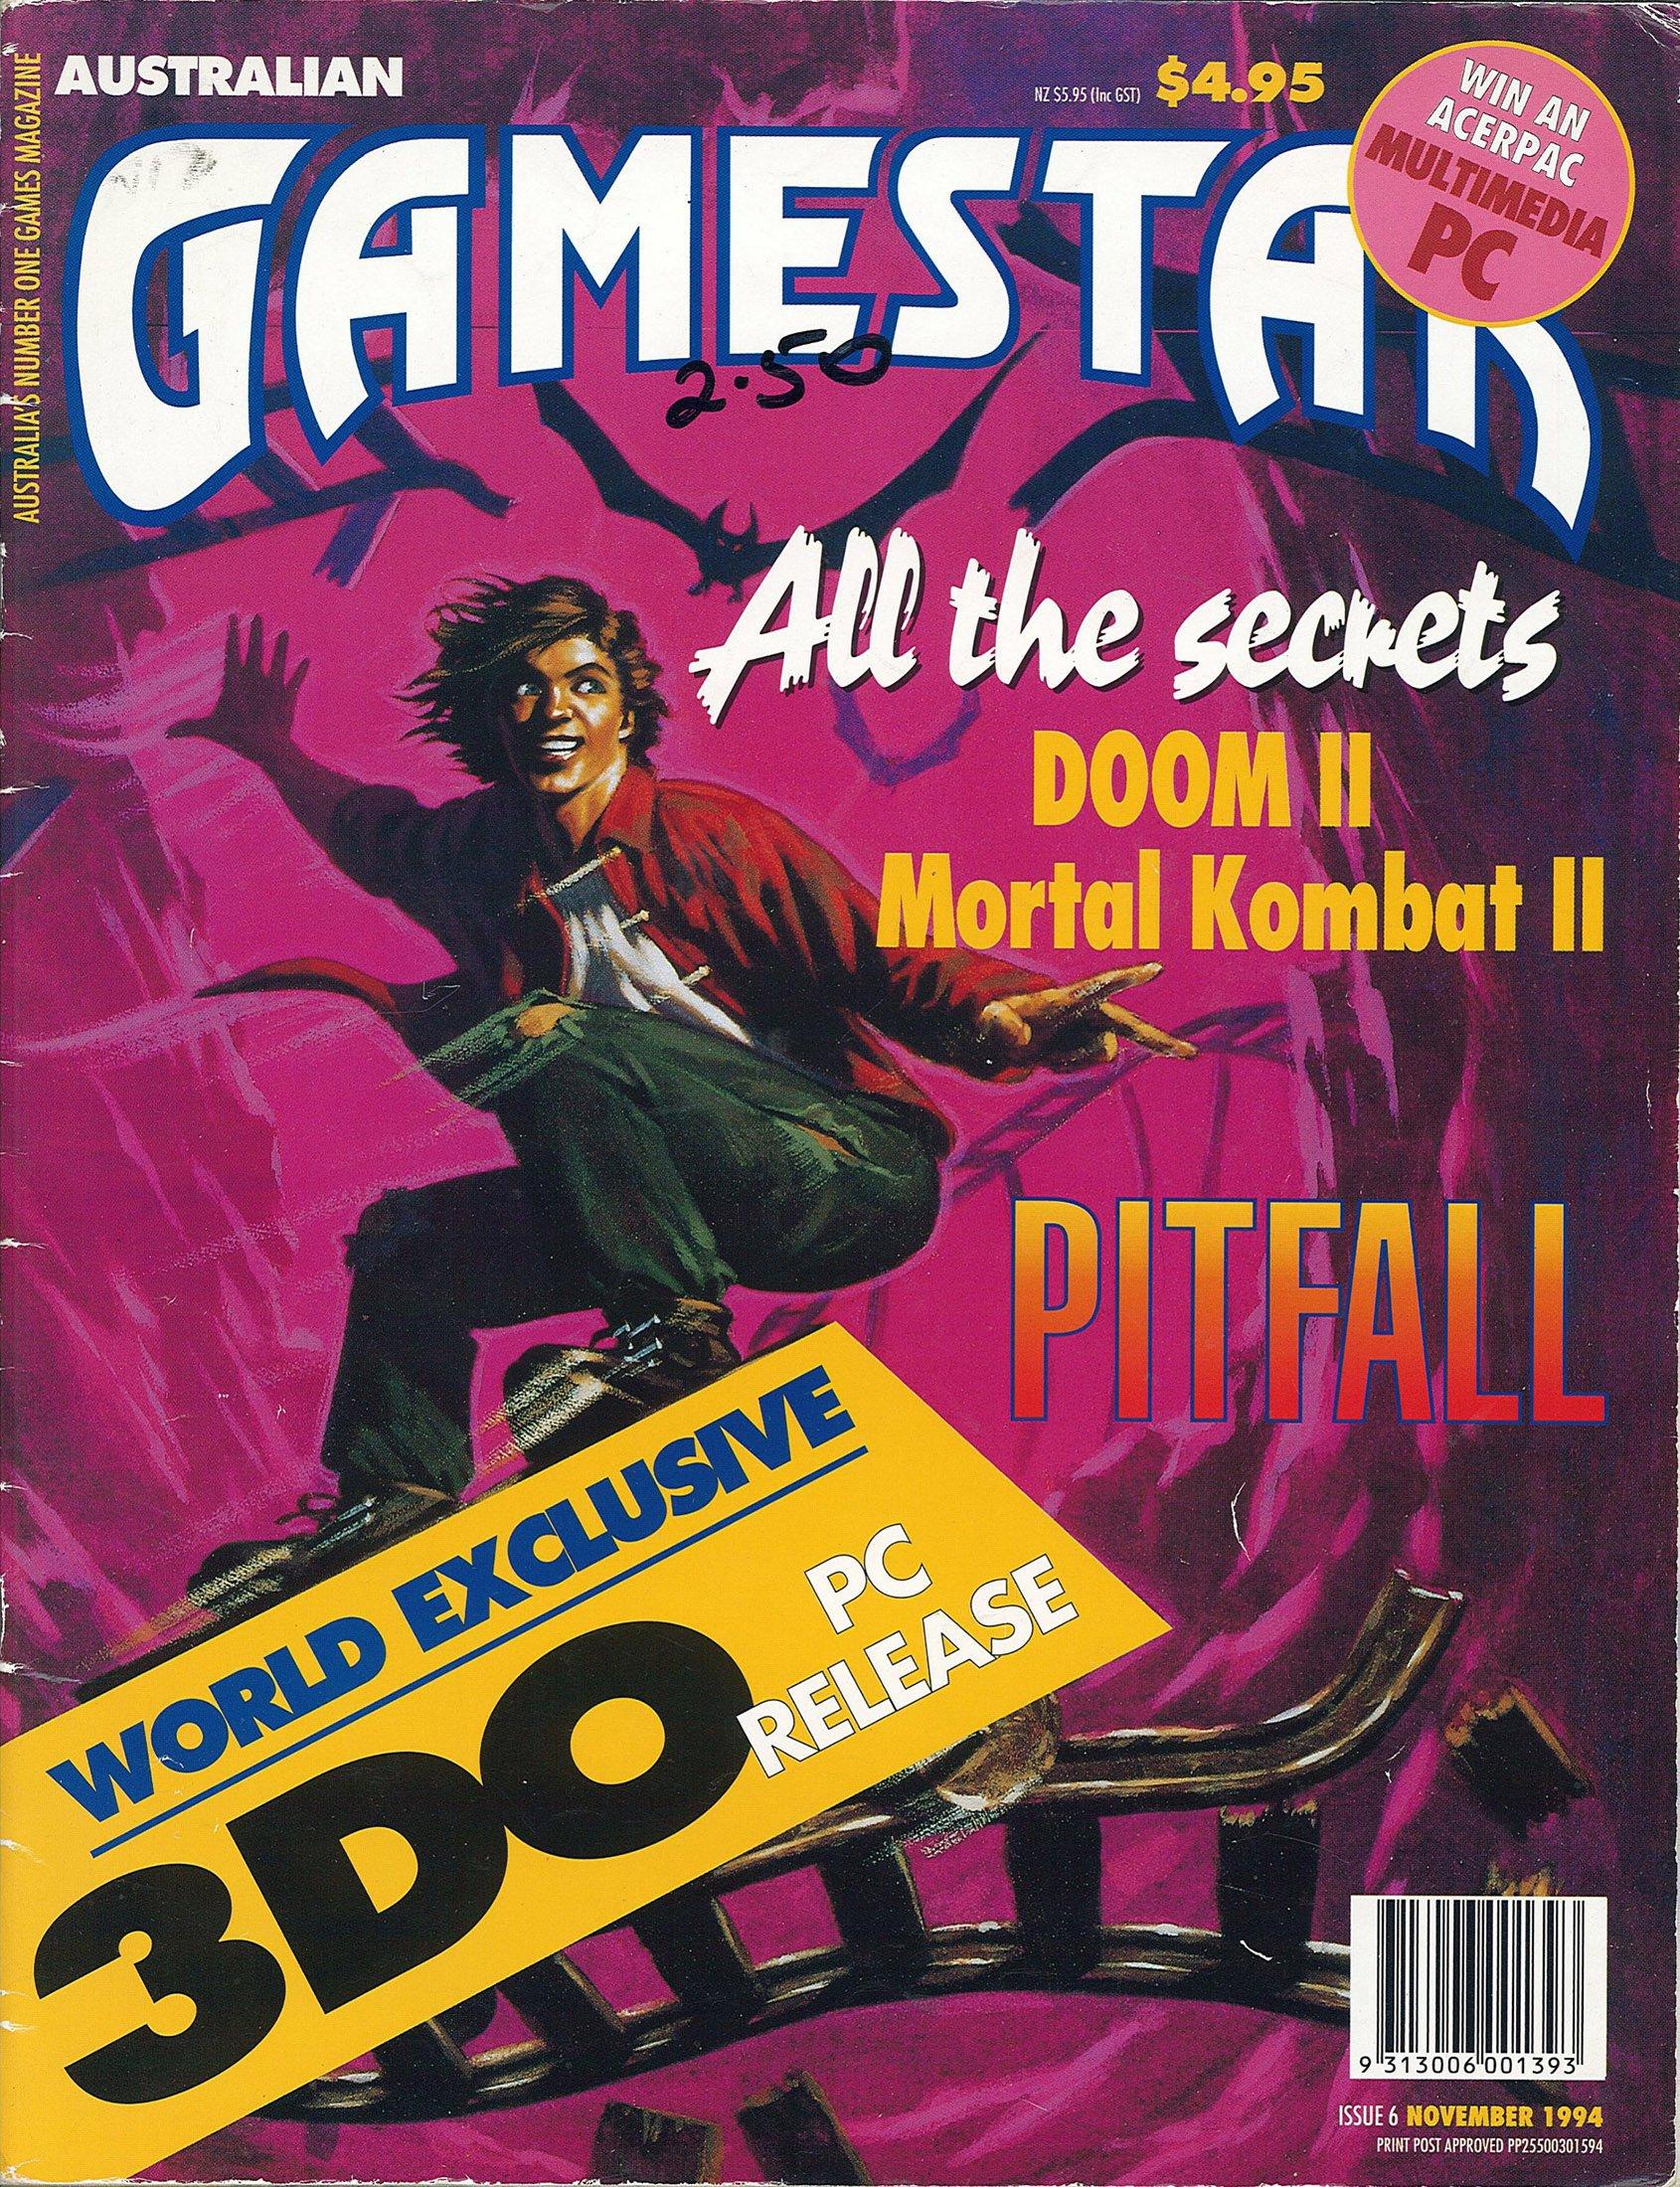 Gamestar 06 (November 1994)